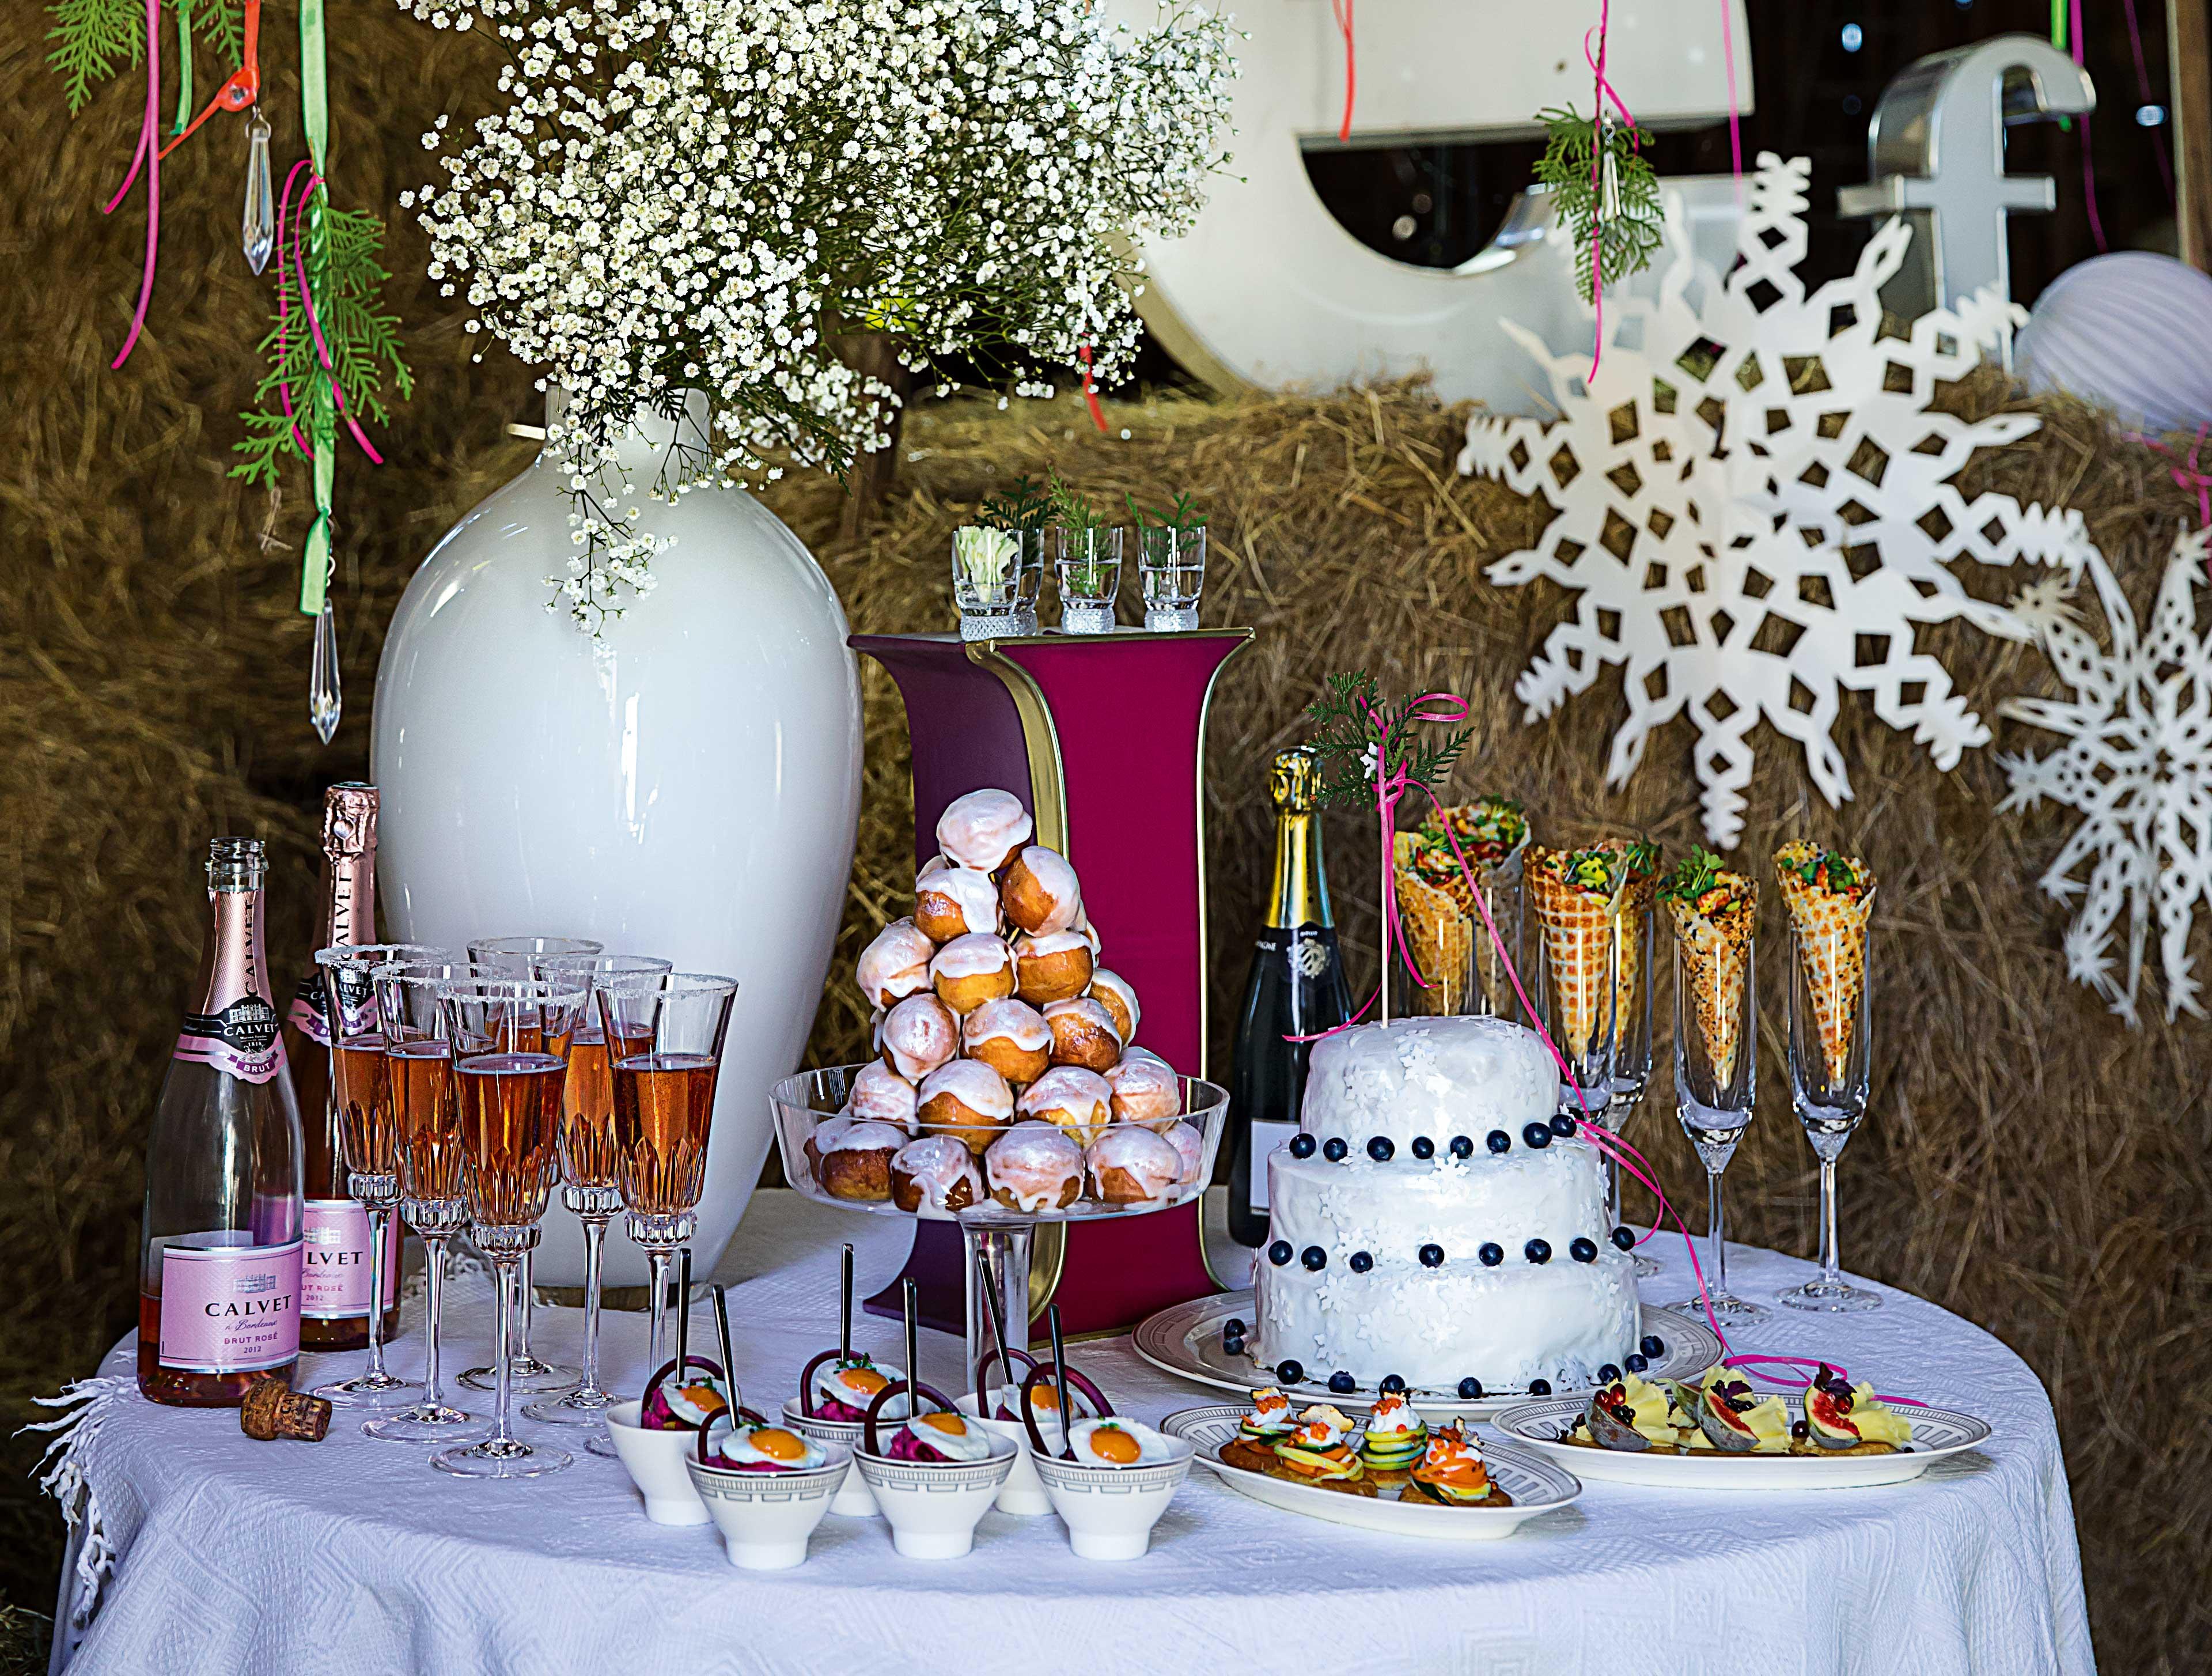 Villeroy & Boch china and drinkware tableware at DIY wedding display